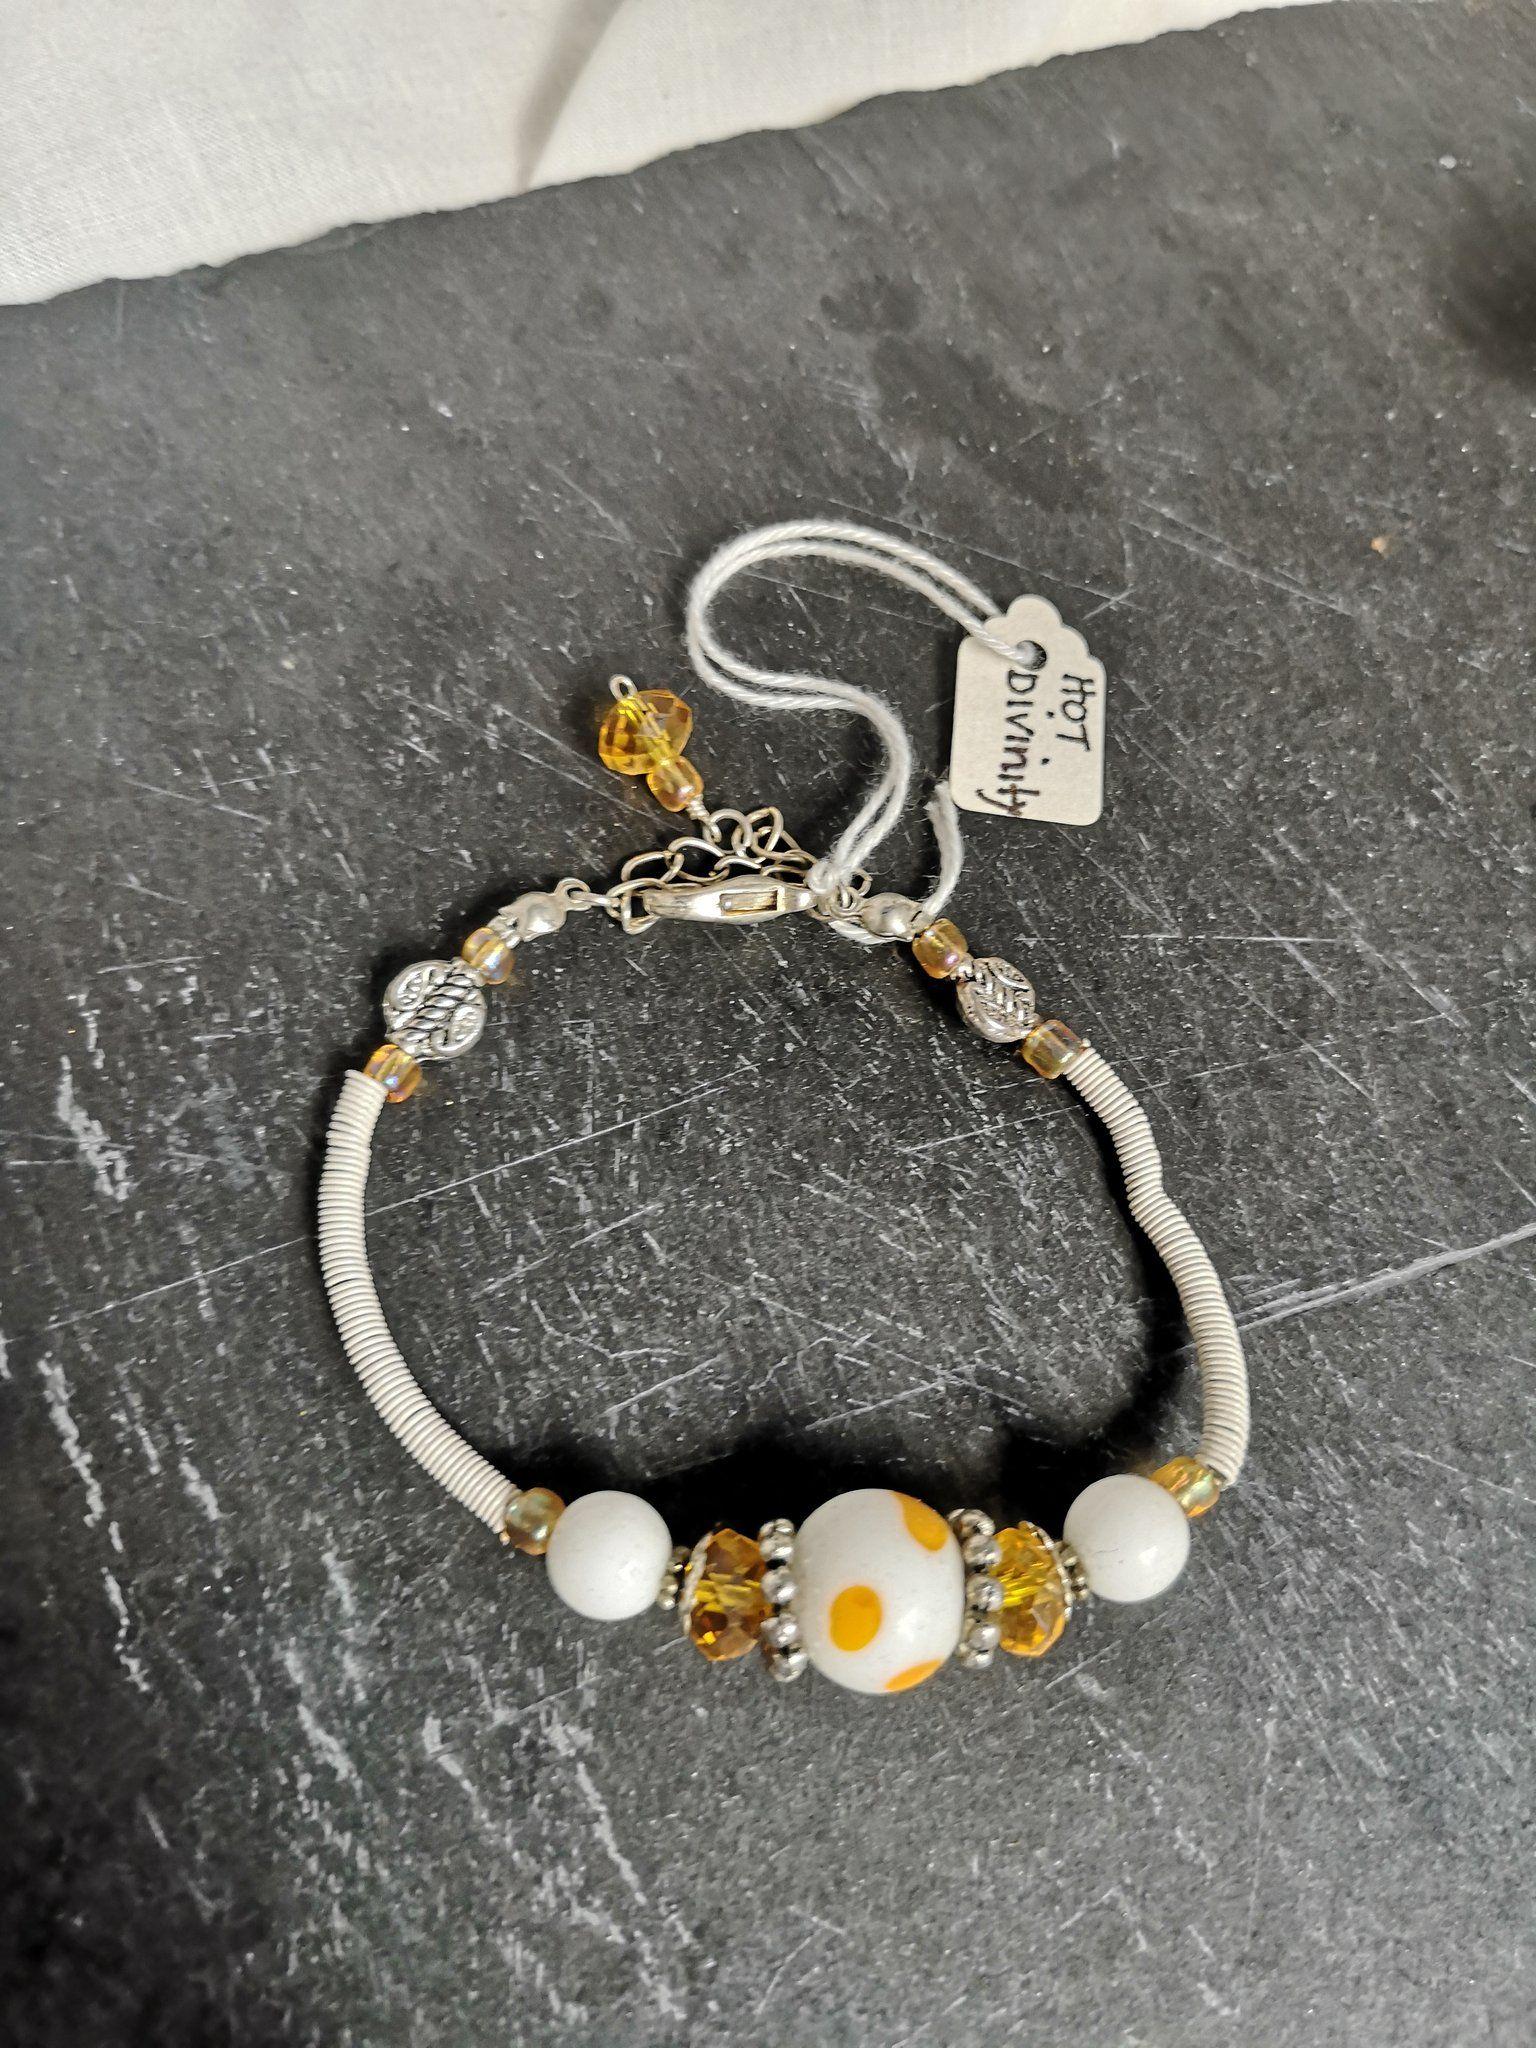 marque populaire rencontrer plutôt sympa Divinity Bracelets, Handmade, with Lampwork focal beads ...